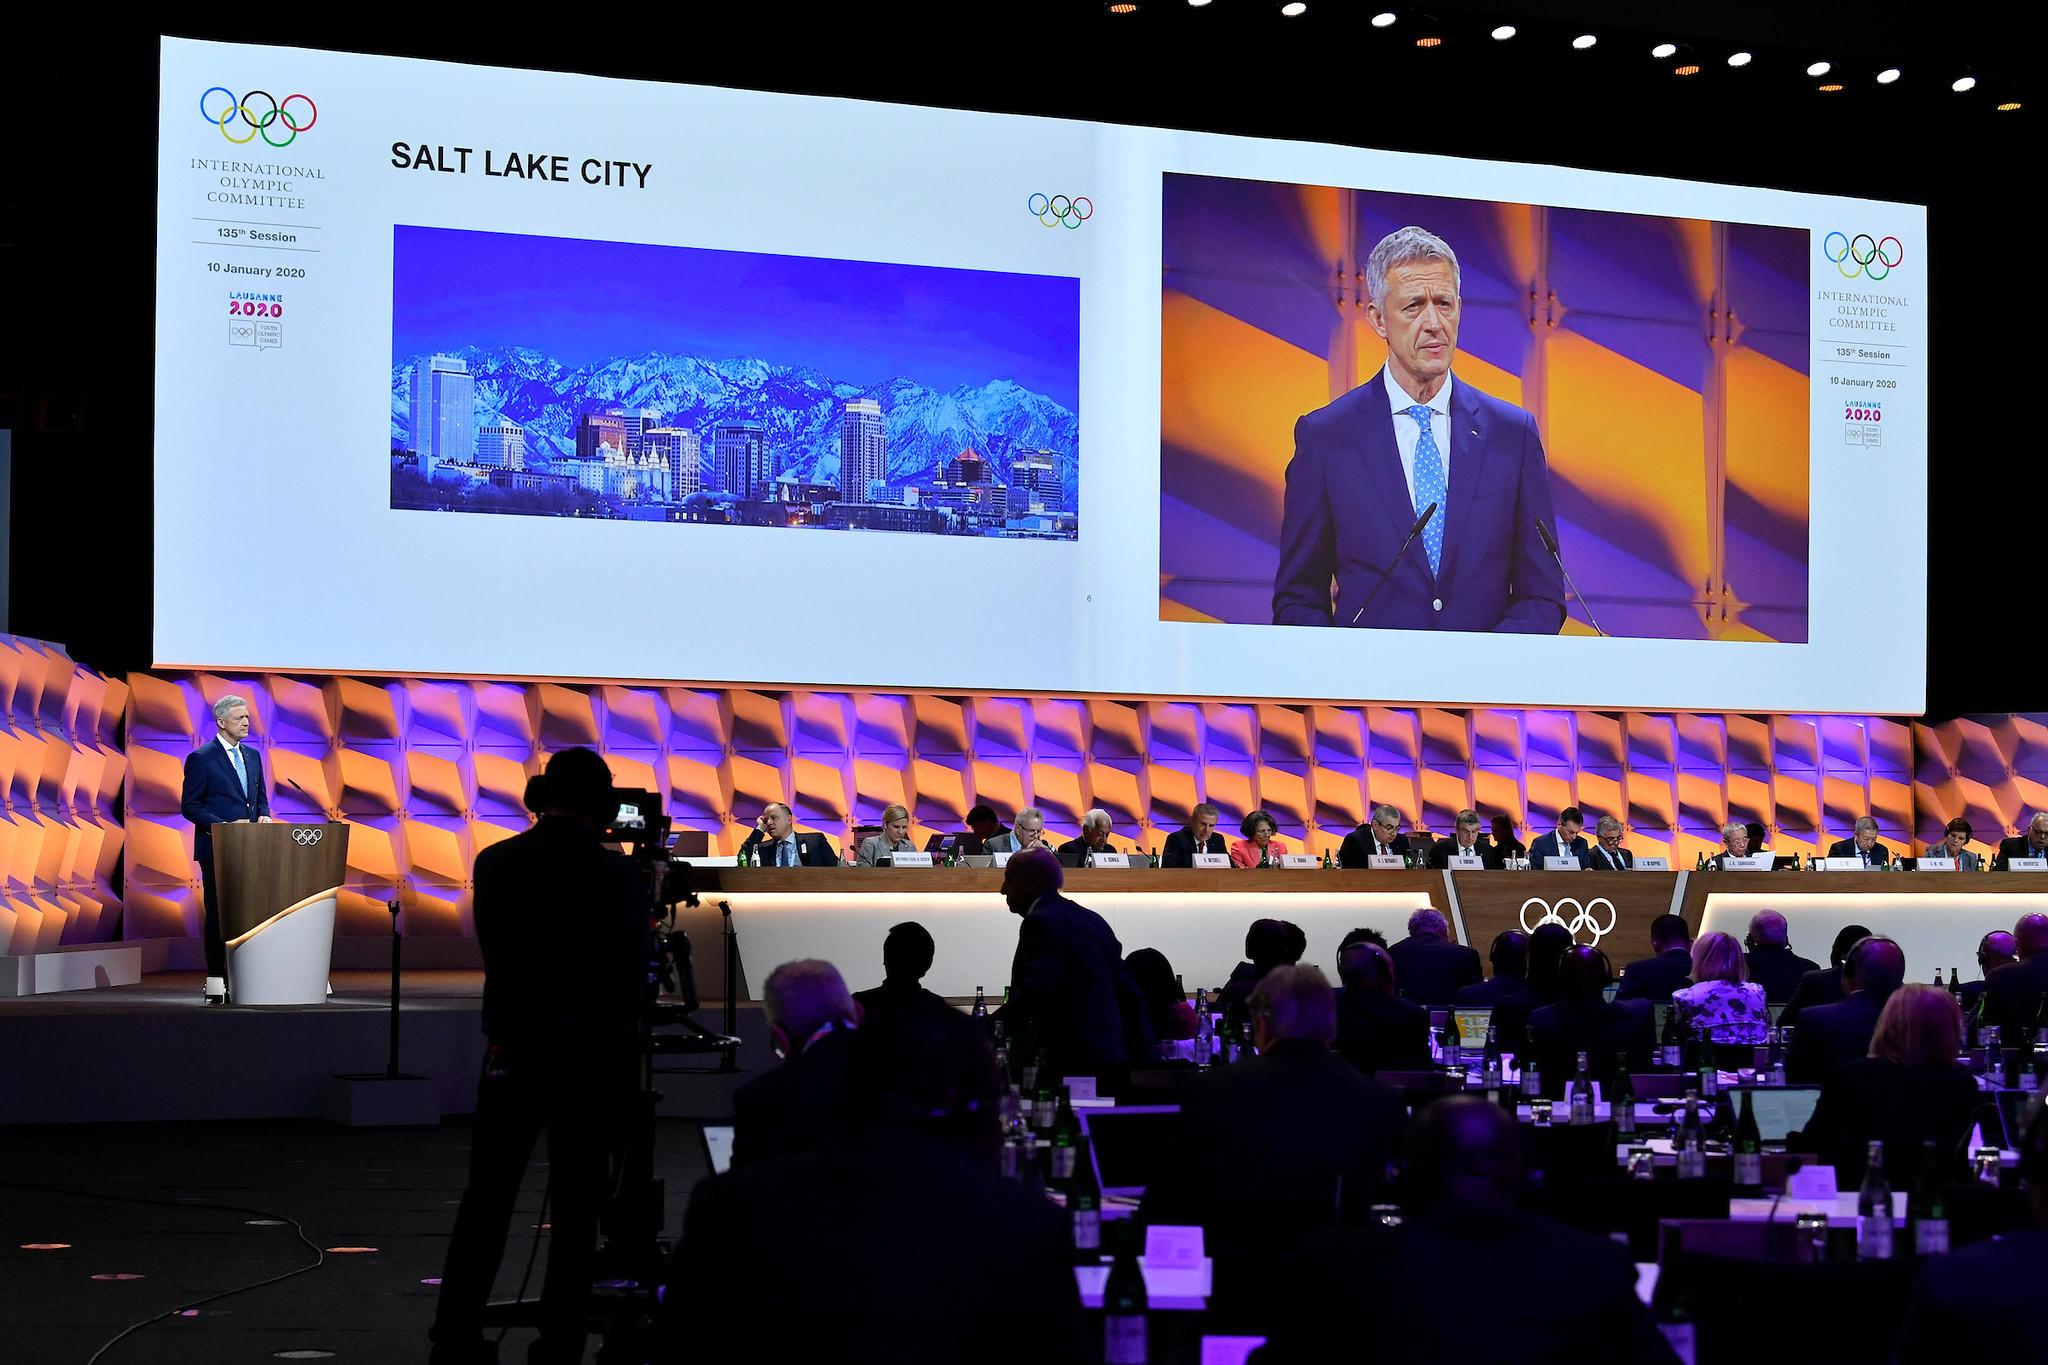 IOC Future Winter Host Commission chairman Octavian Morariu updated the IOC Session on potential Winter Olympic city bidders ©IOC